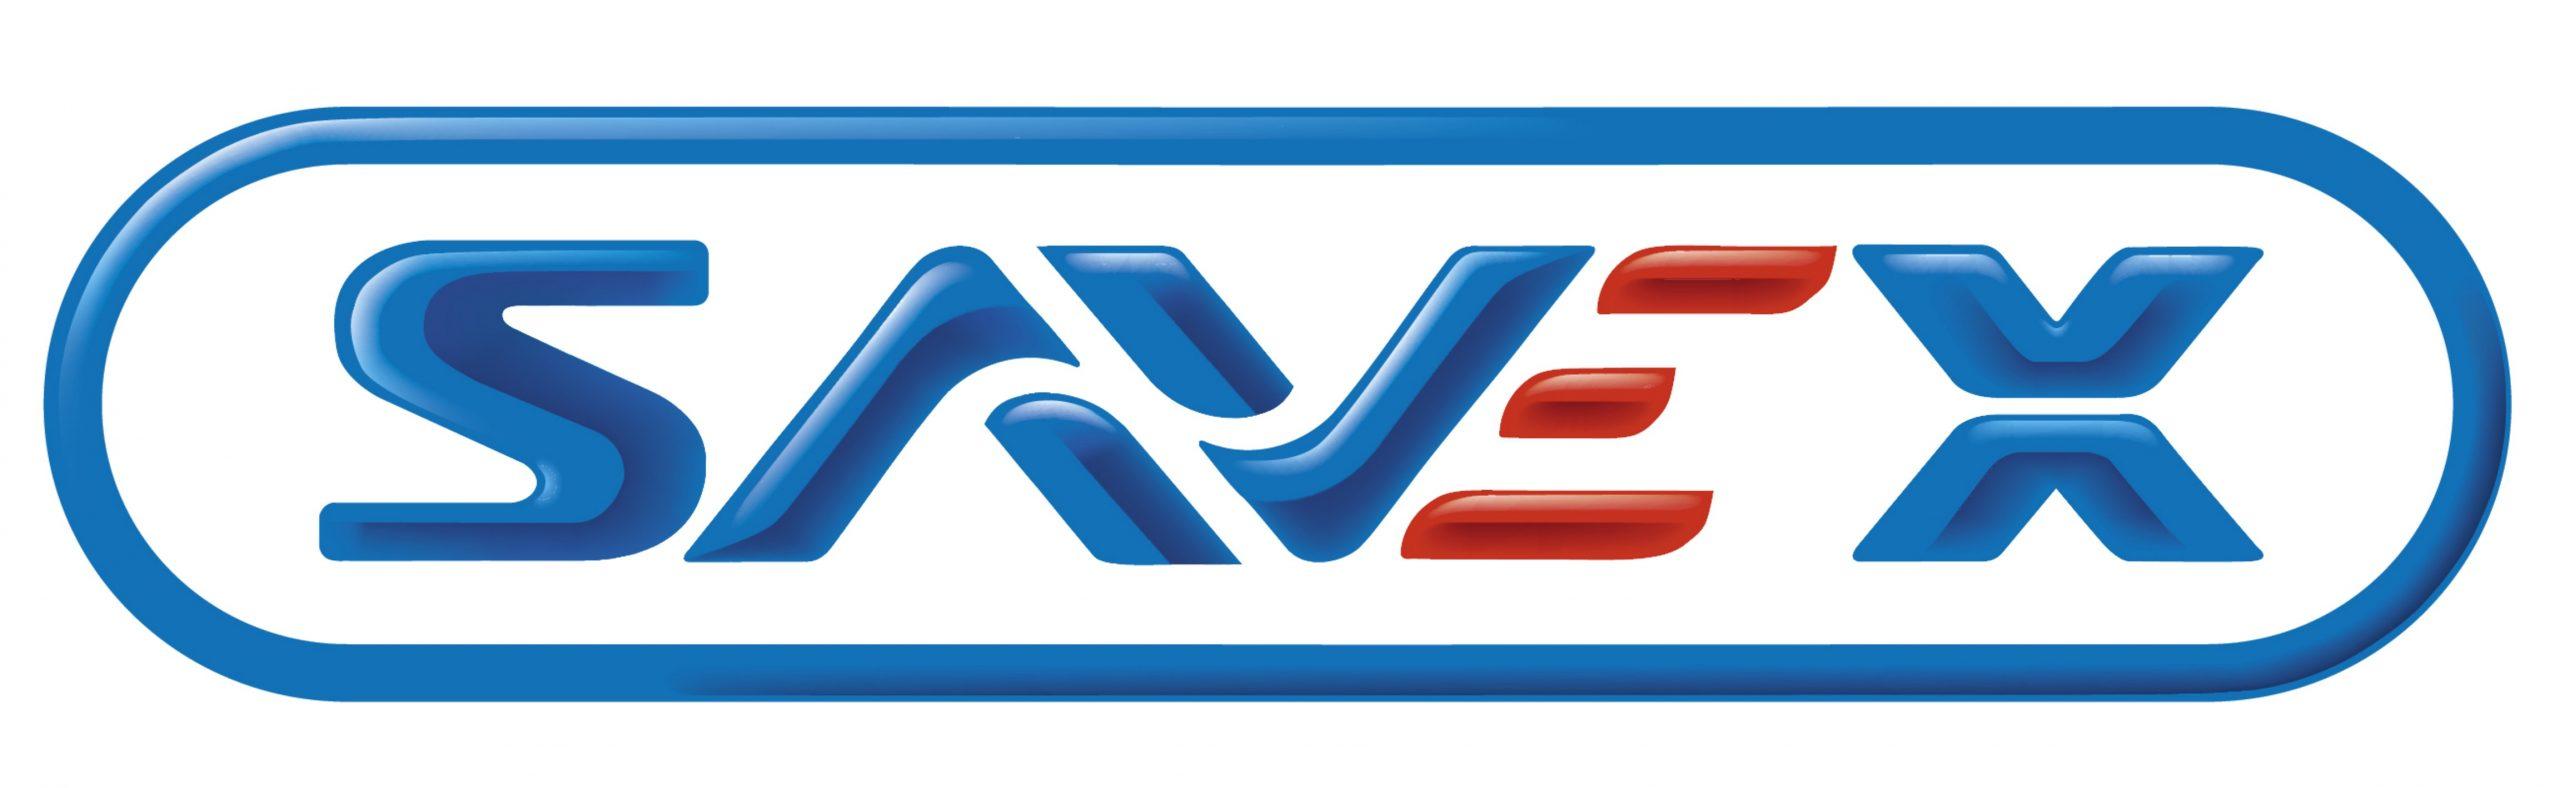 Savex logo